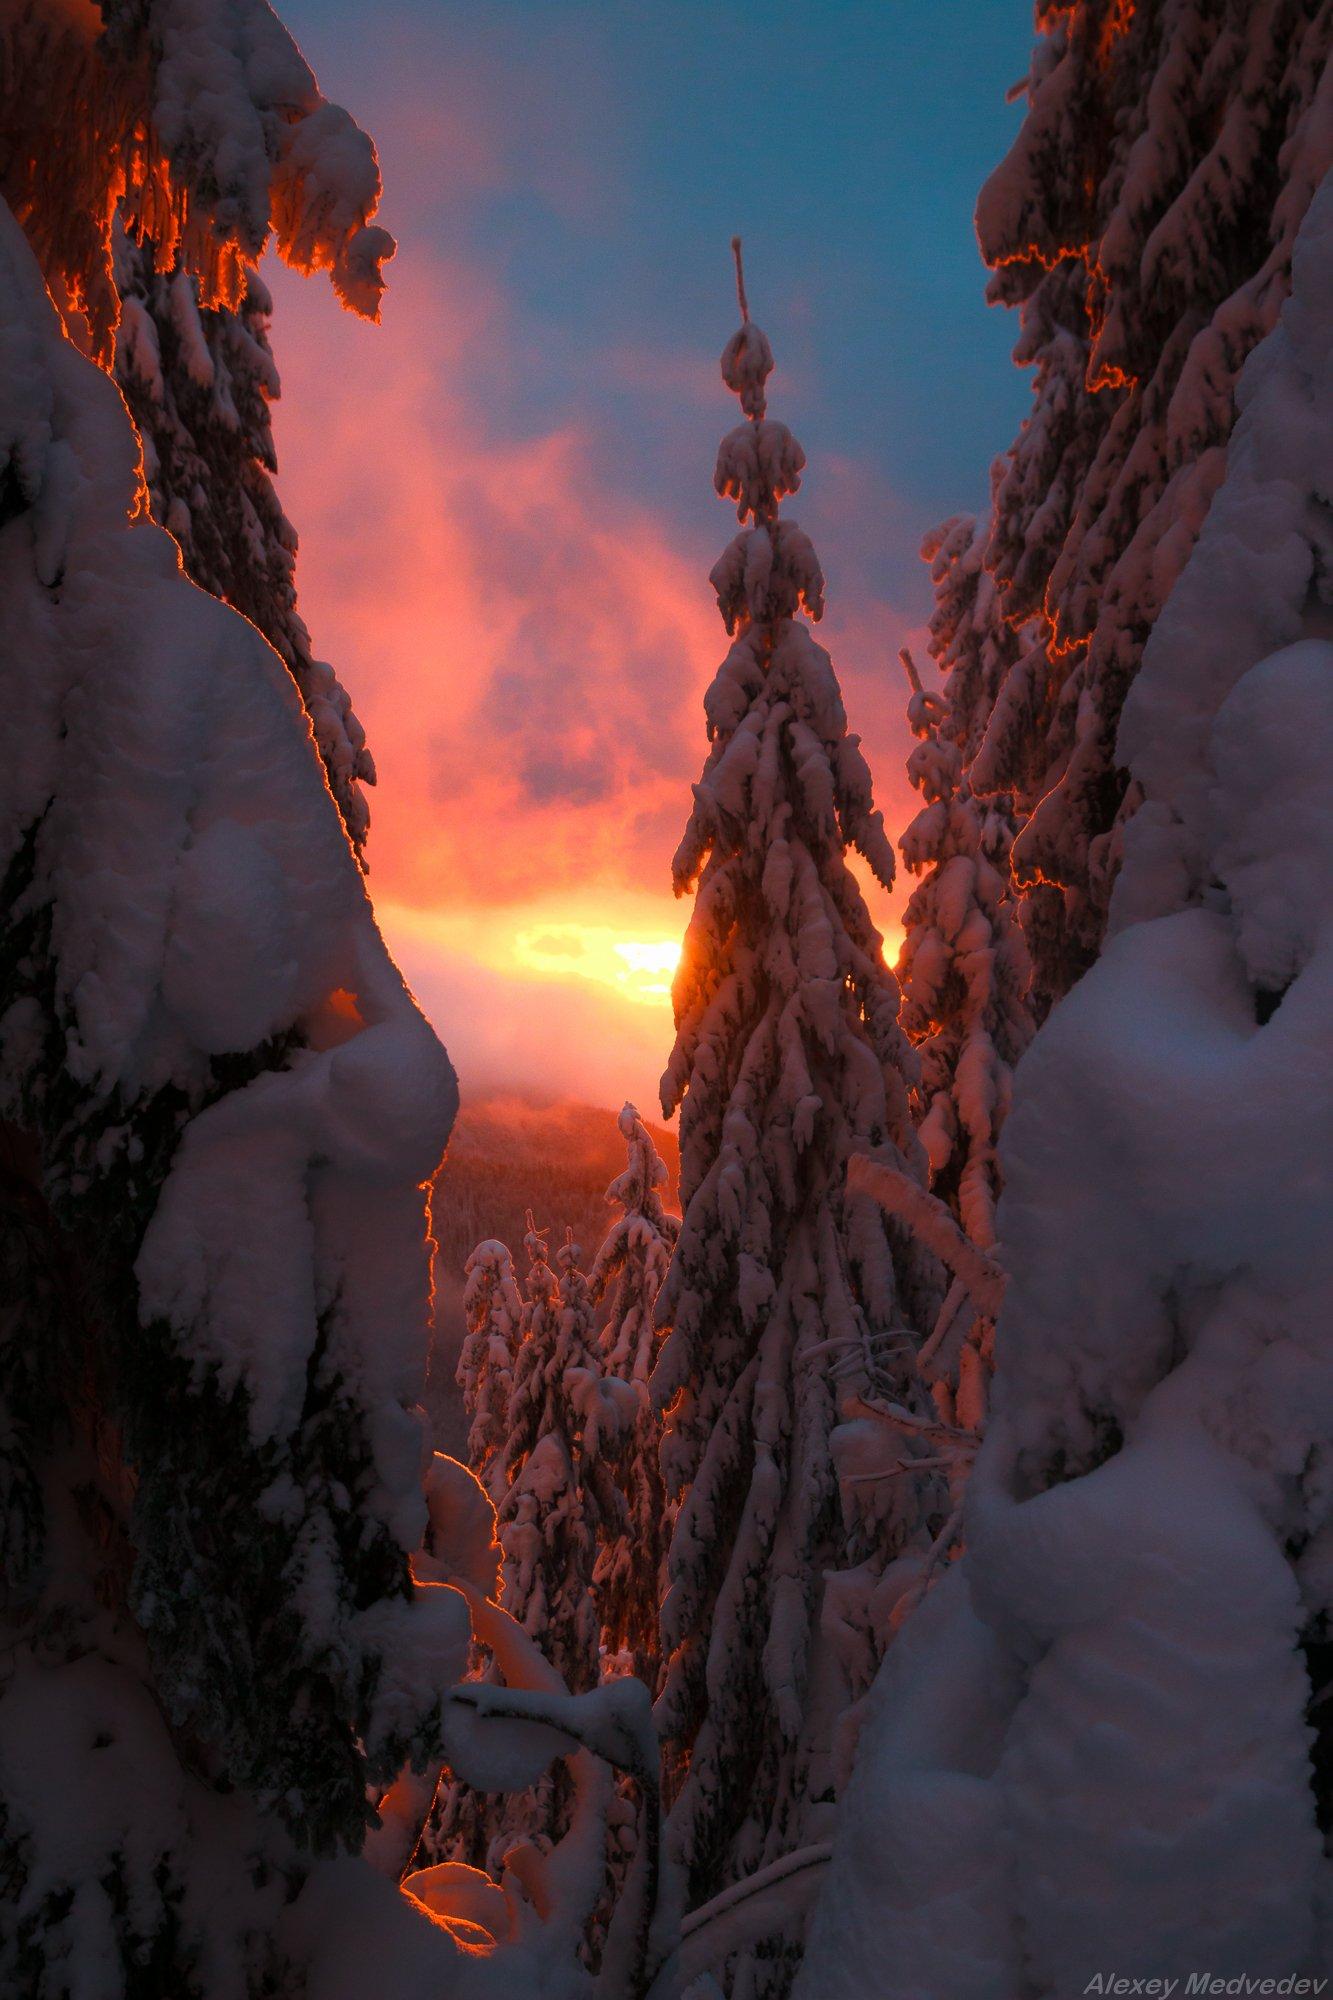 горы, гори, Закарпаття, зима, Карпати, Свидовець, лопухів, лопухов, свидовец, карпаты, закарпатье, свет, закат, солнце, яркий, Алексей Медведев